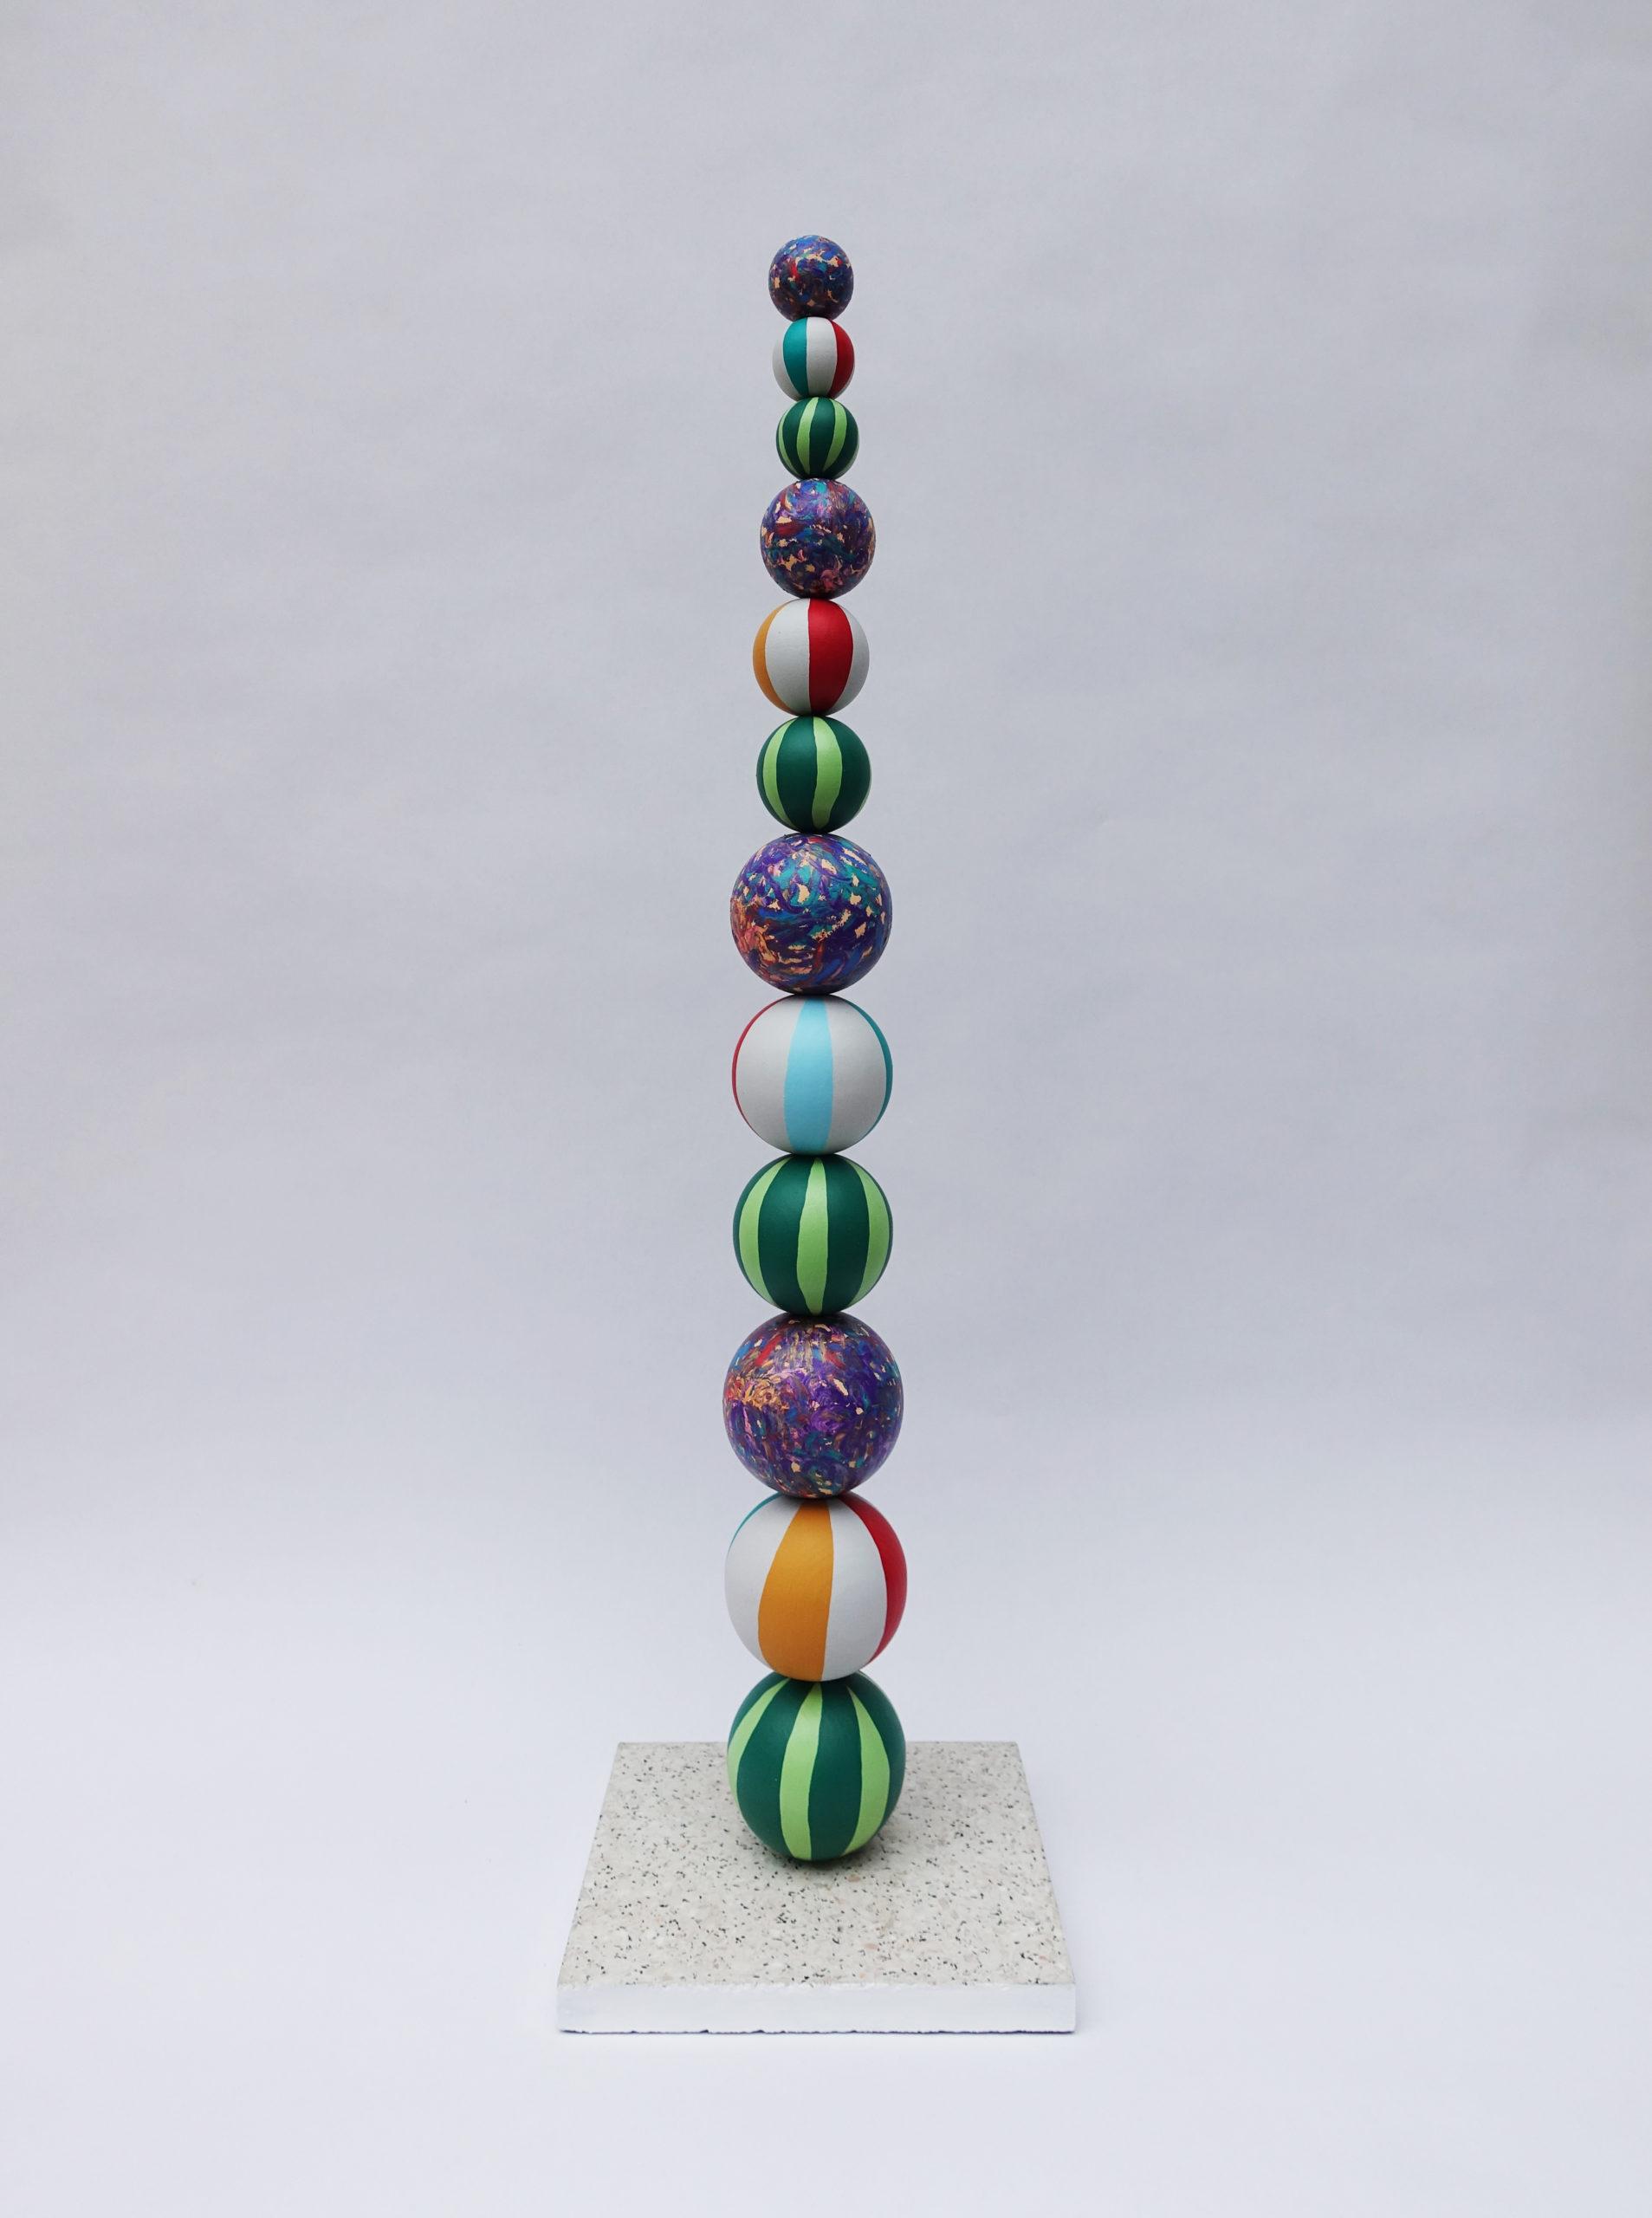 Sculpture 1